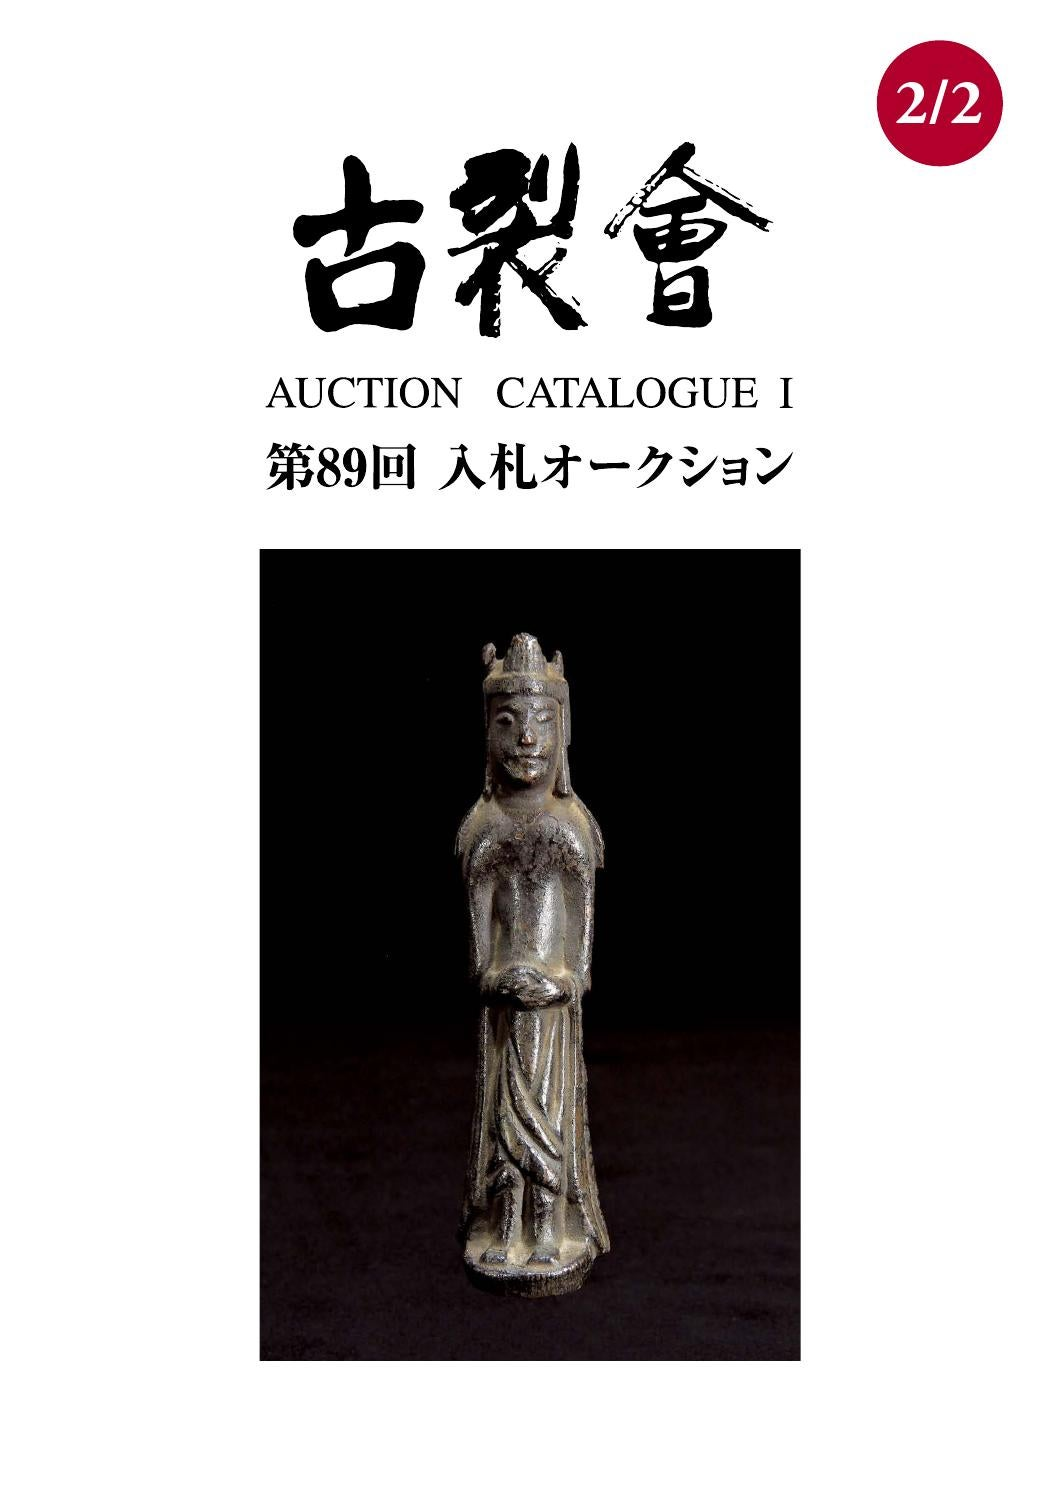 KOGIRE-KAI 89th Silent Auction Catalogue I 2/2 by KOGIRE-KAI - issuu